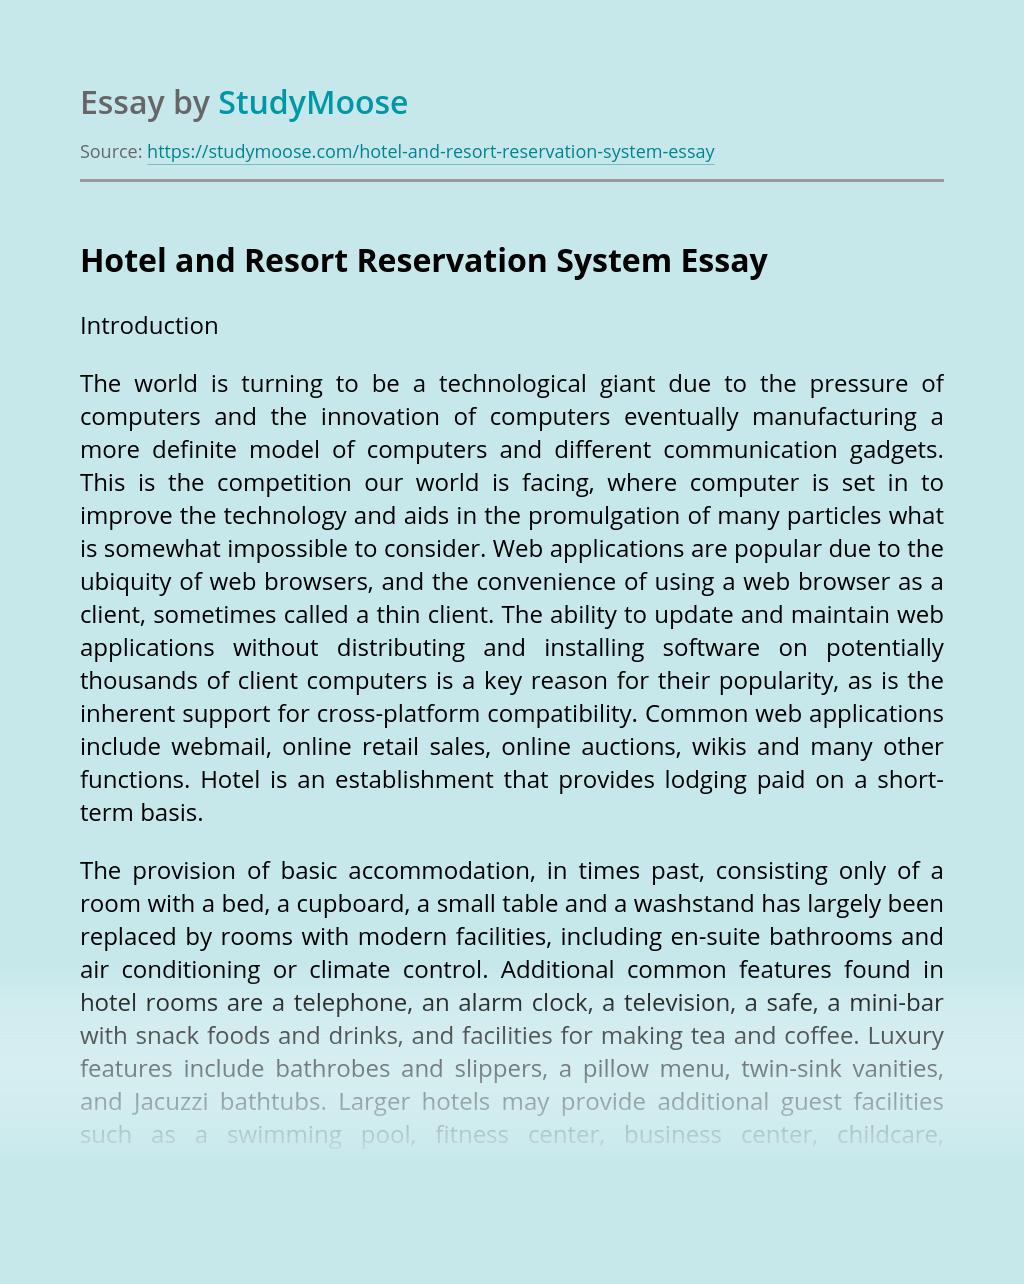 Hotel and Resort Reservation System